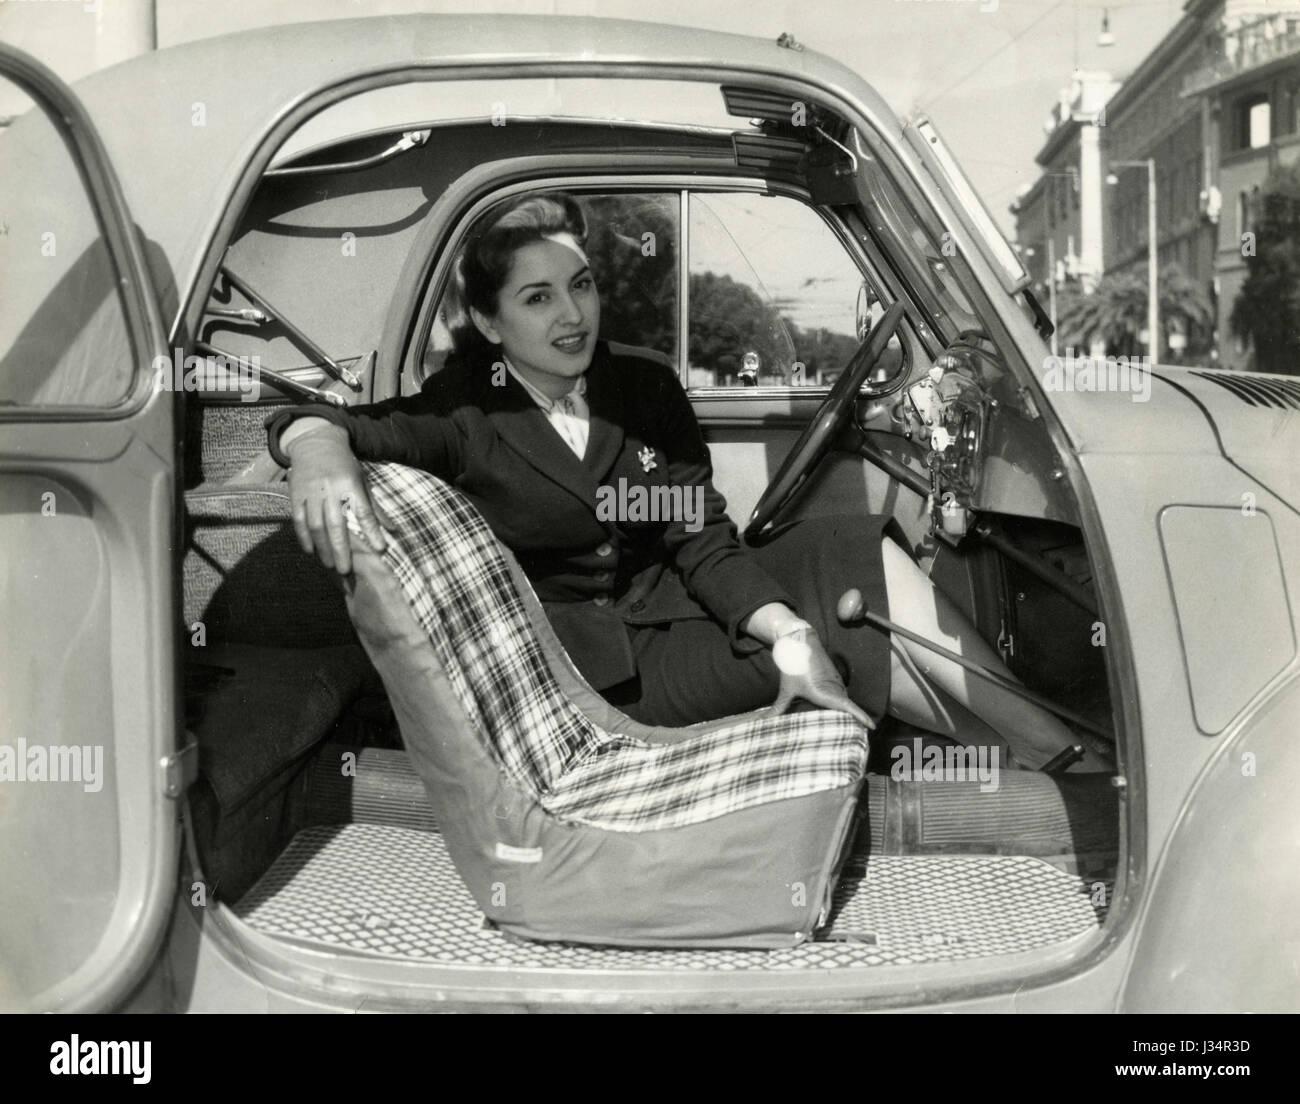 Car Stock Photos: 1950s Woman Car Stock Photos & 1950s Woman Car Stock